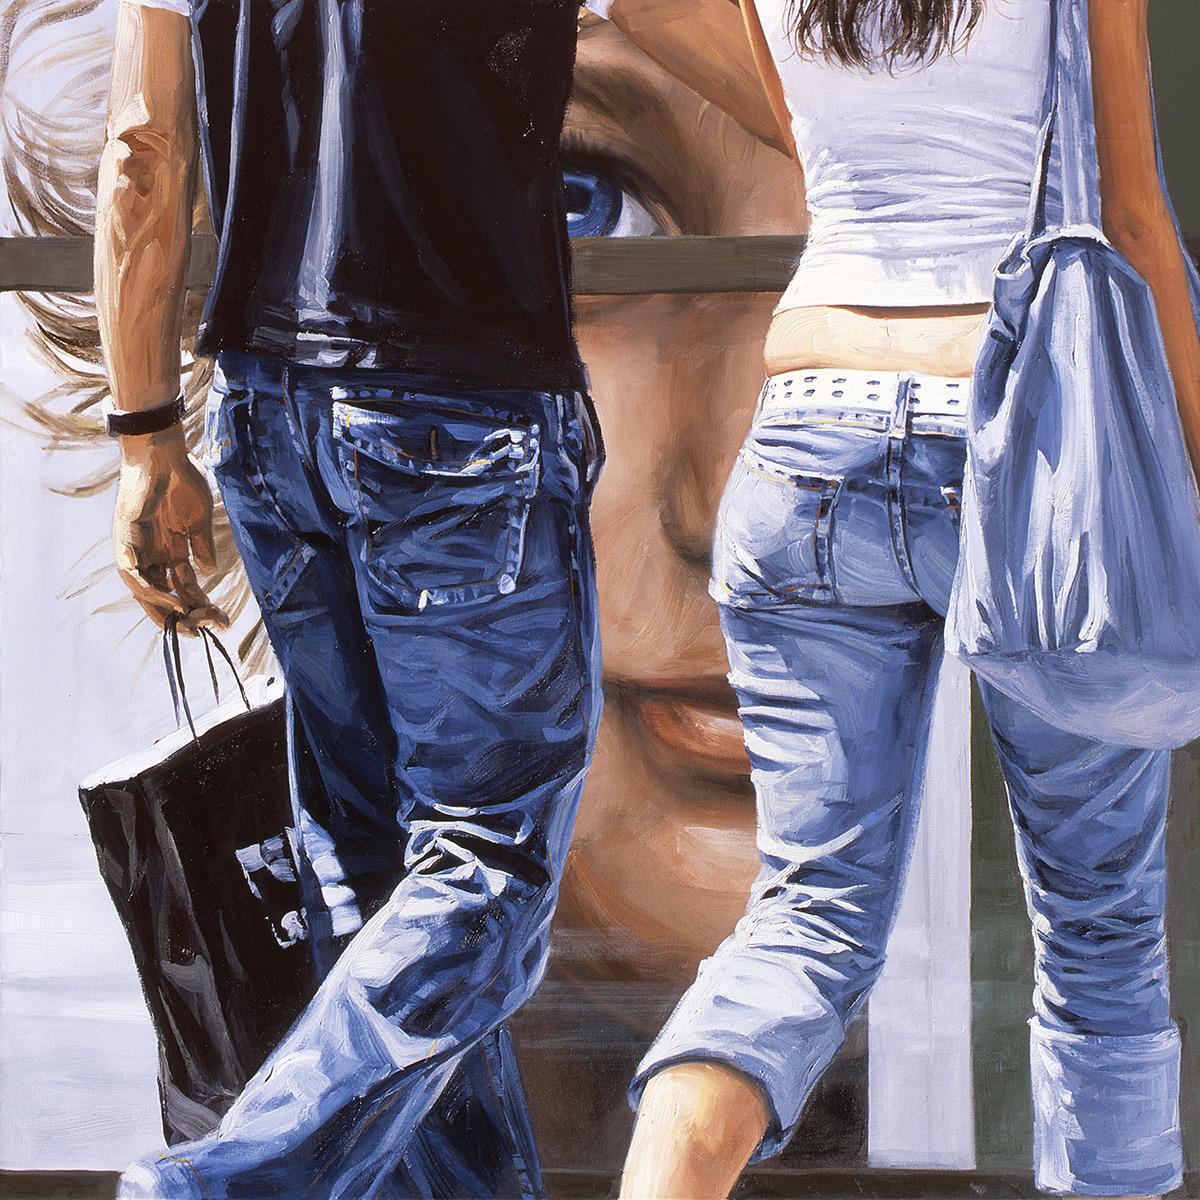 jeans-walking-shopping-130x130cm.jpg